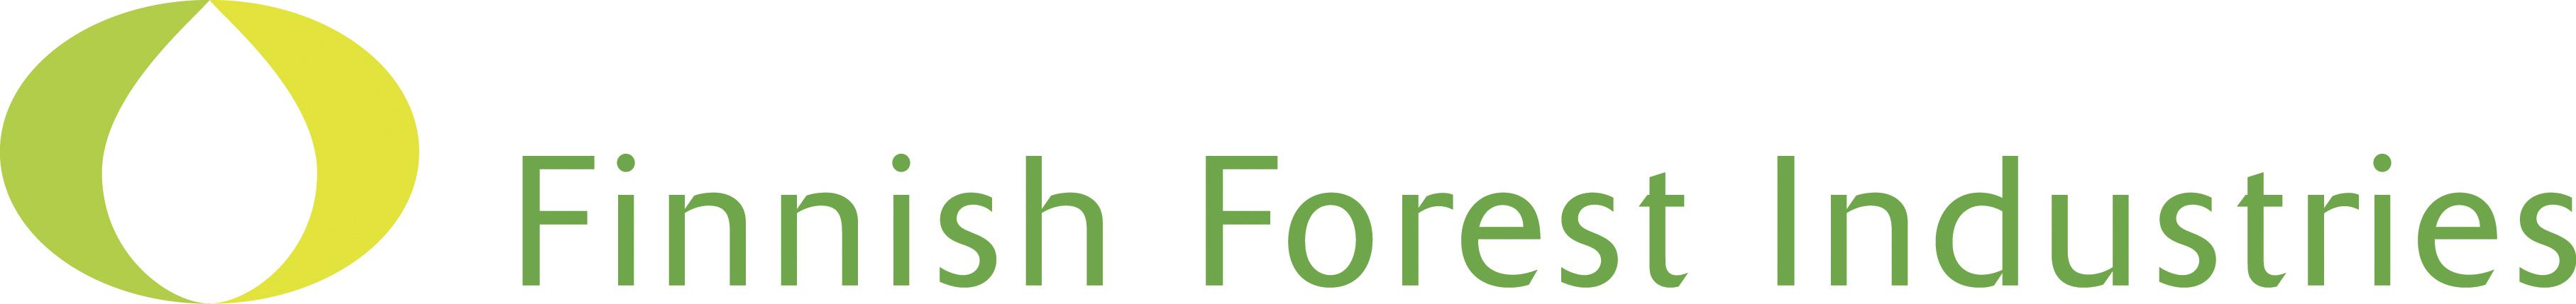 Finnish Forest Industries Federation